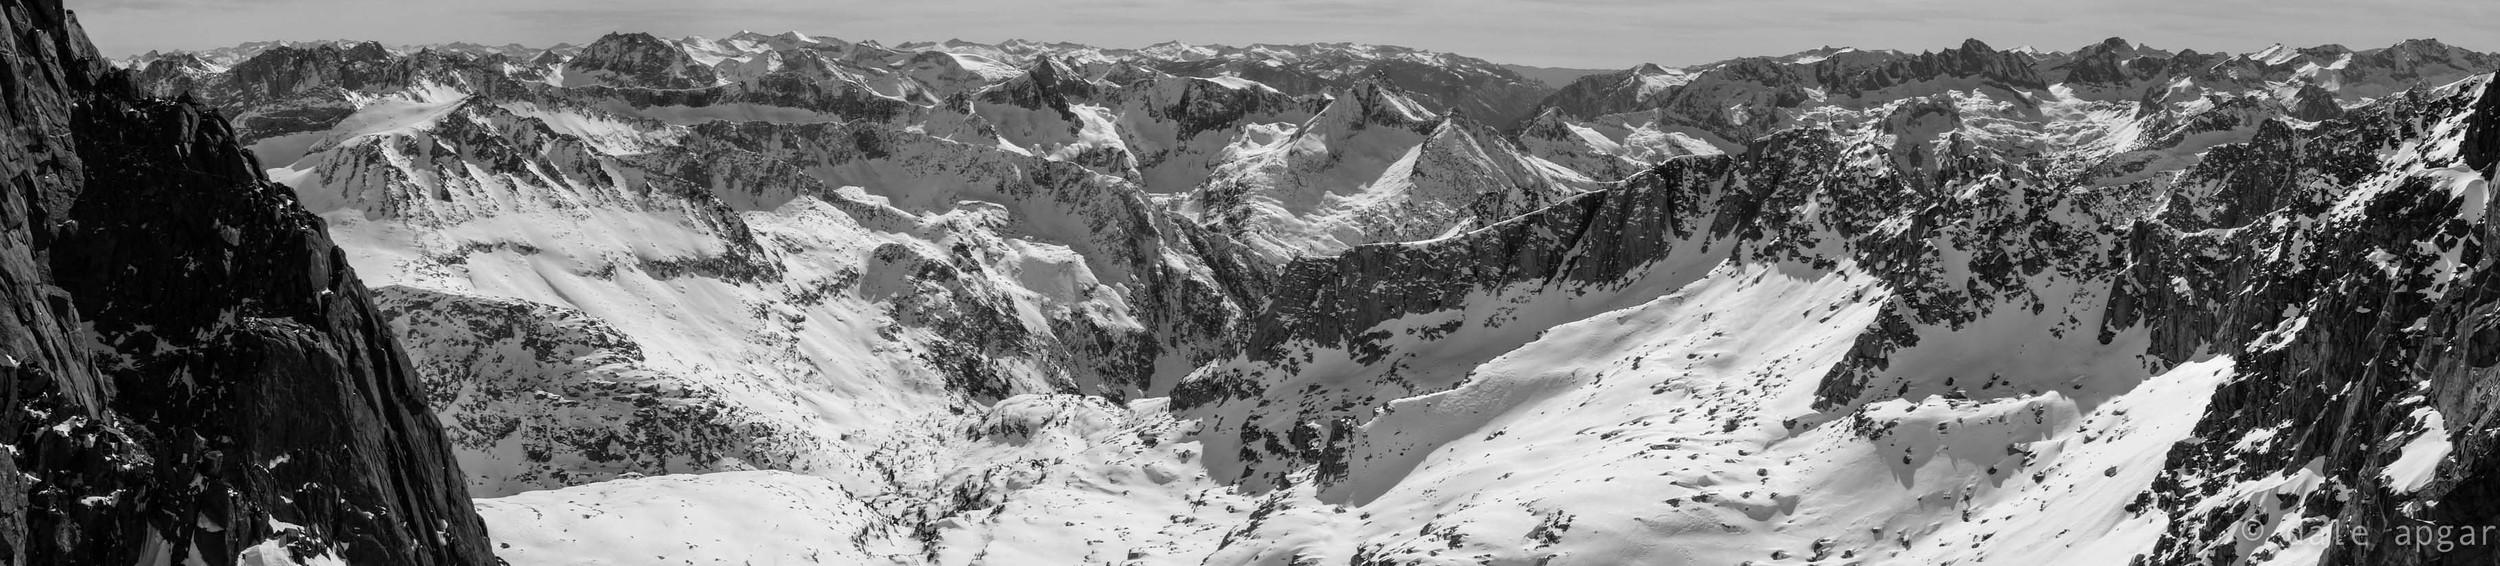 mountain_hangover_one-8.jpg